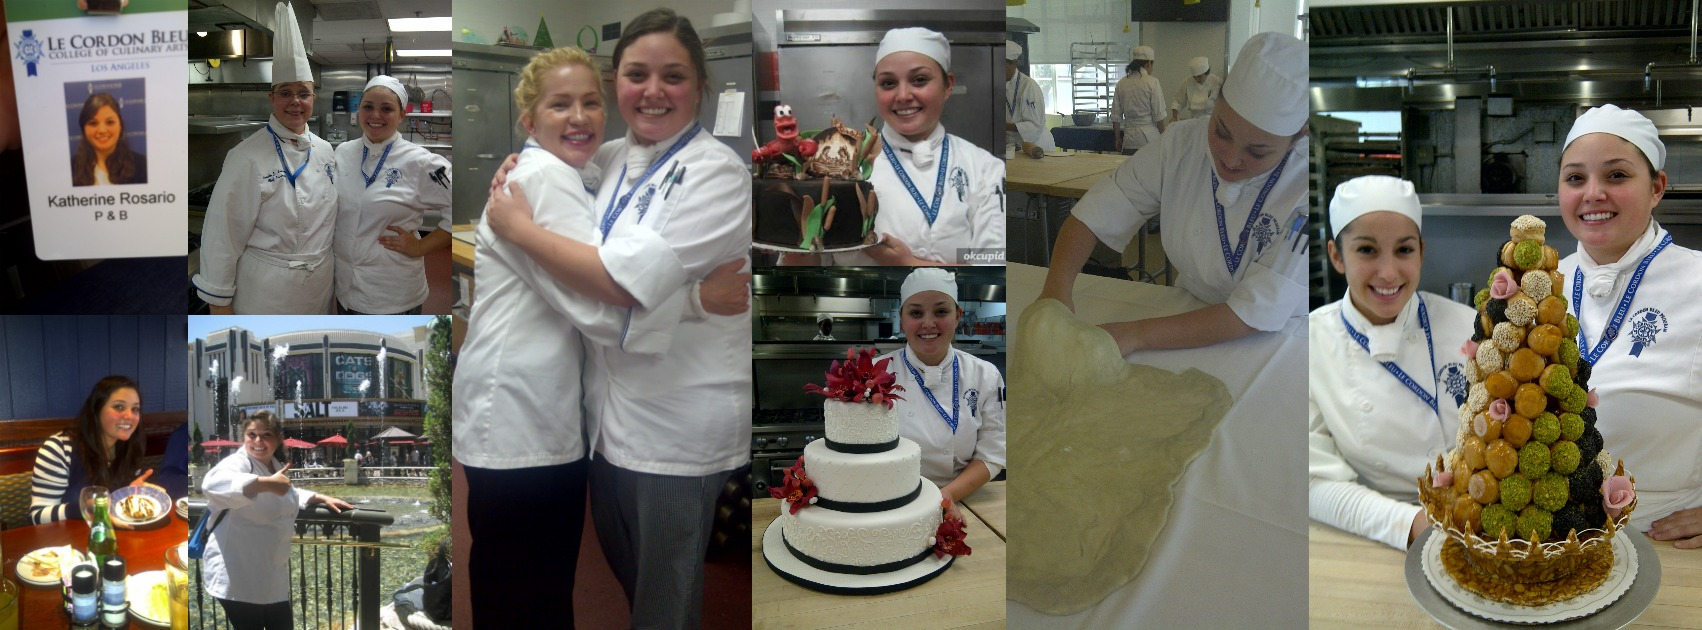 my-story-culinary-school-1